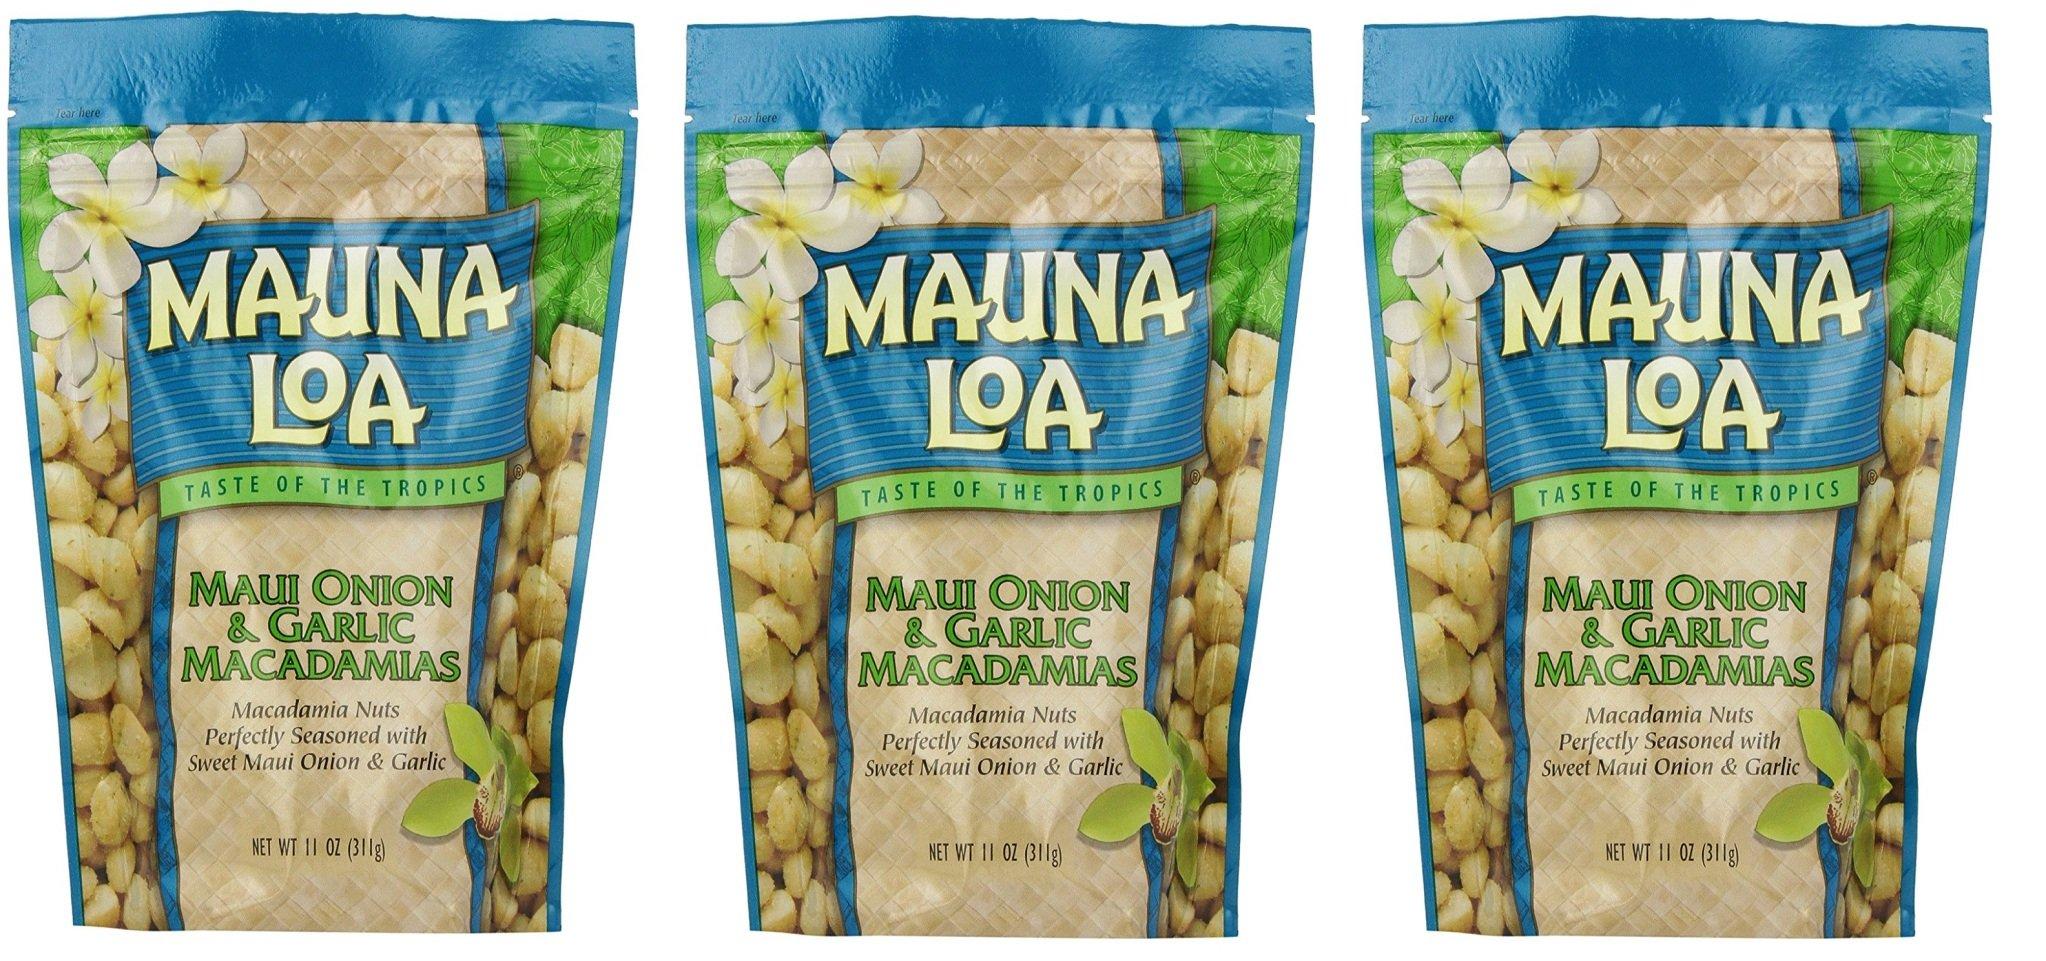 Mauna Loa Macadamias, VycdTT 3 Pack (Maui Onion and Garlic)